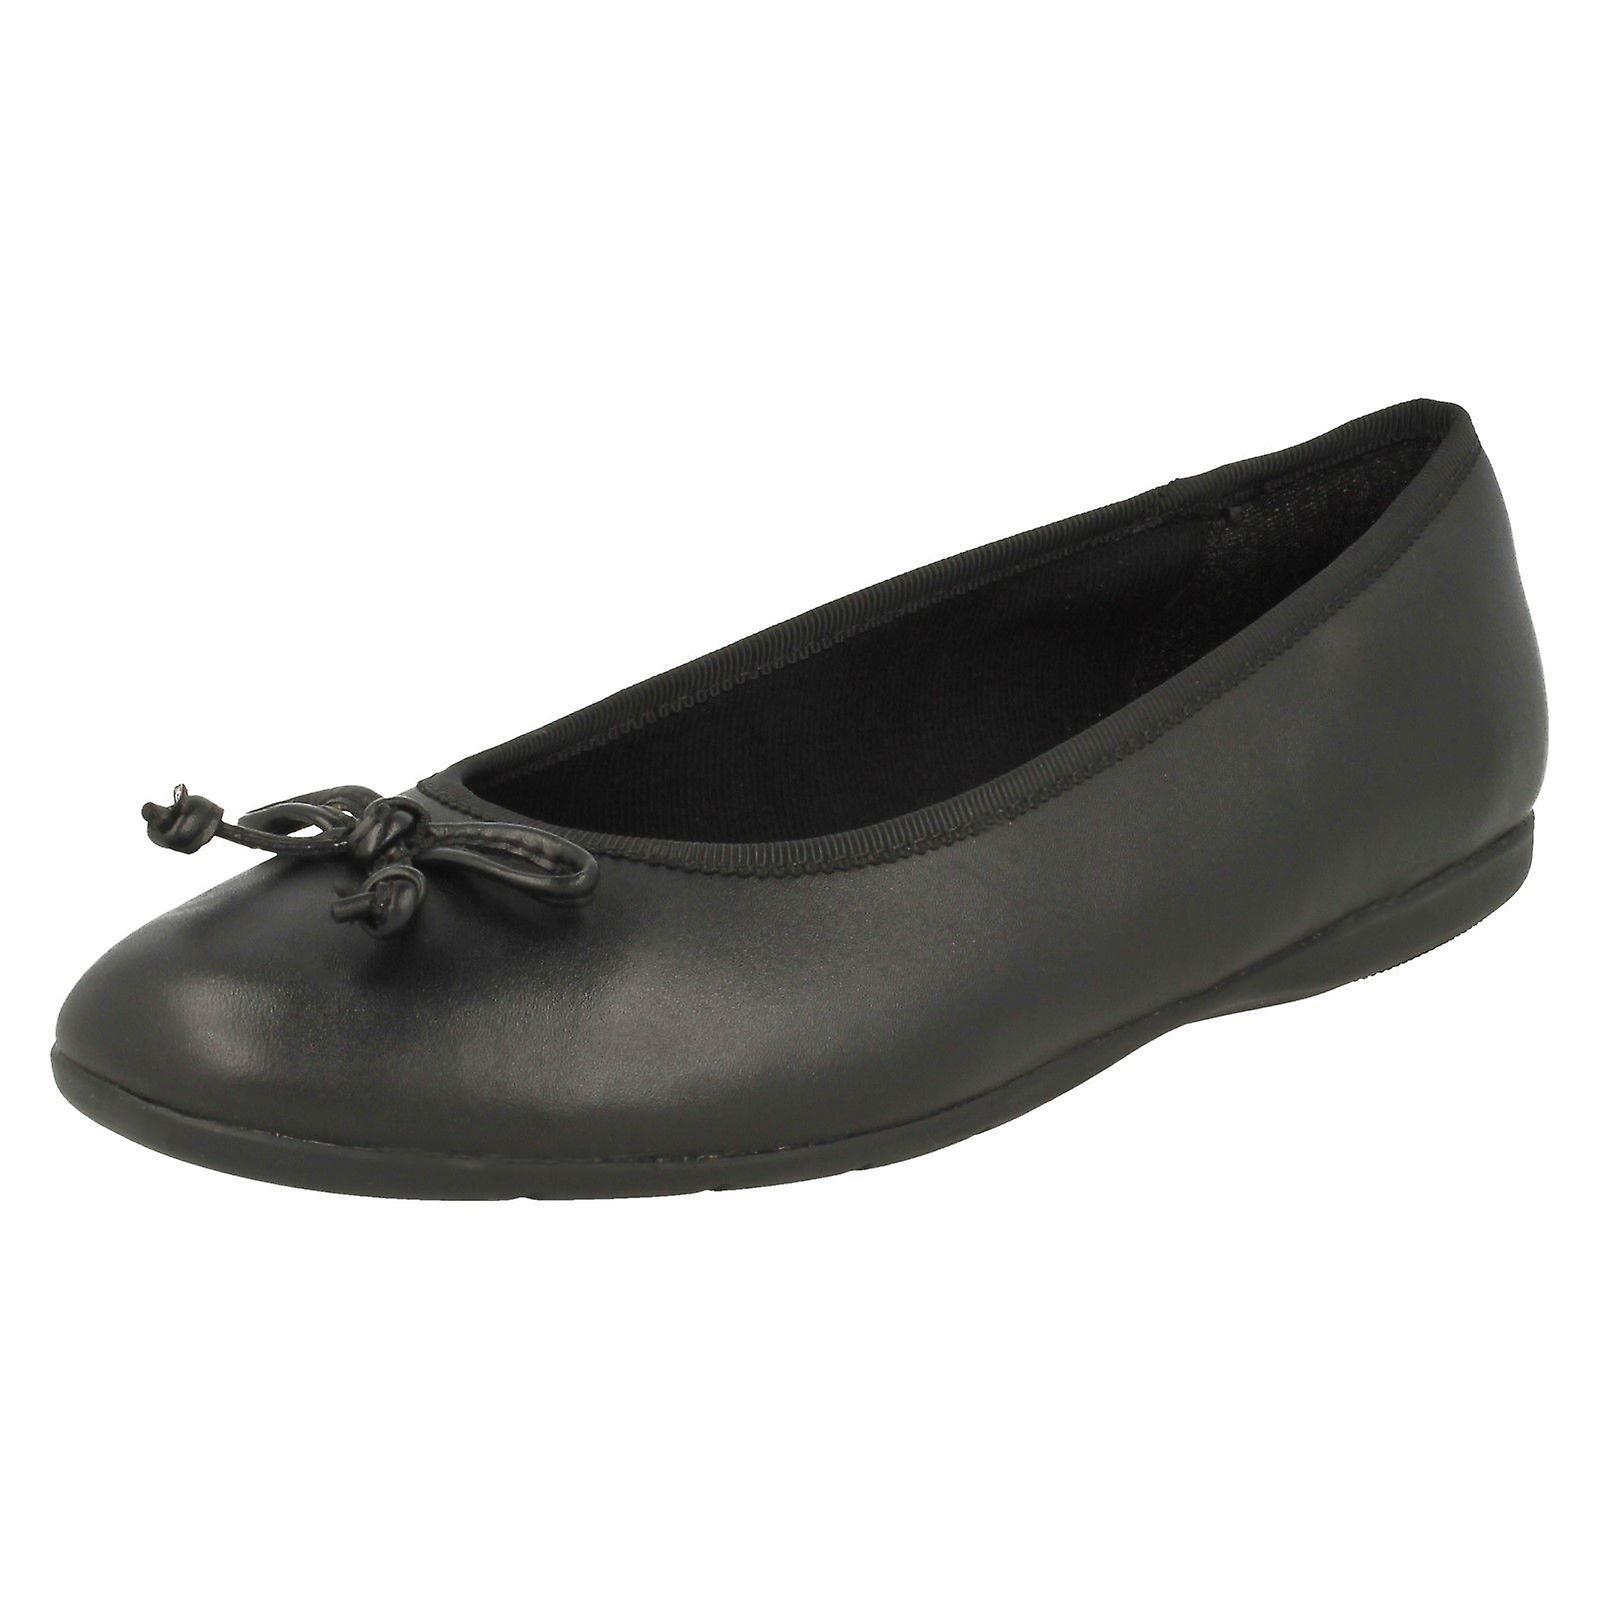 Girls Jesse Clarks Slip On Bow School Shoes Jesse Girls Shine/ Quality Priority /Gentleman/Lady 8482f9